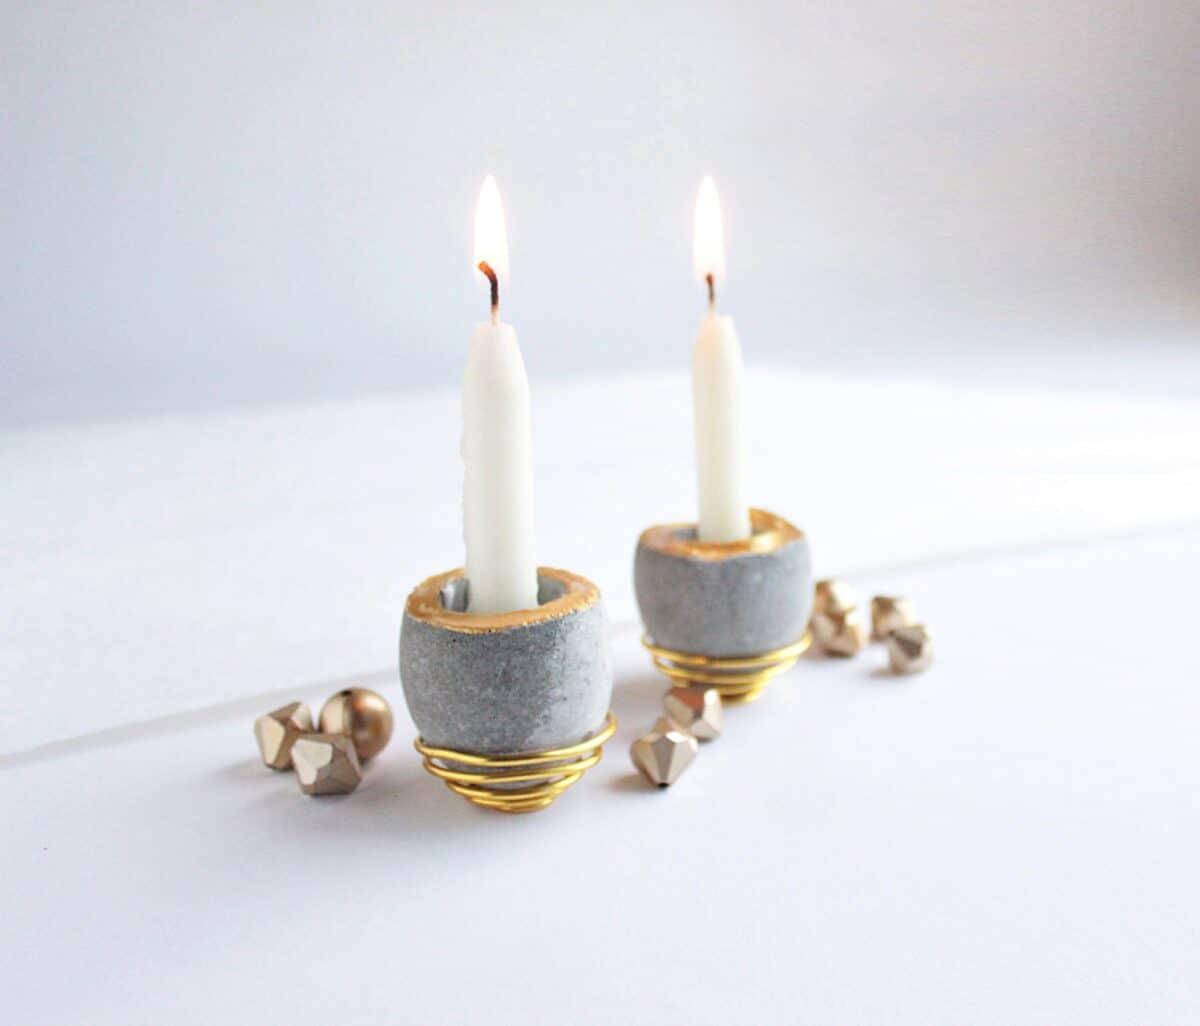 miniature egg shaped concrete candleholders